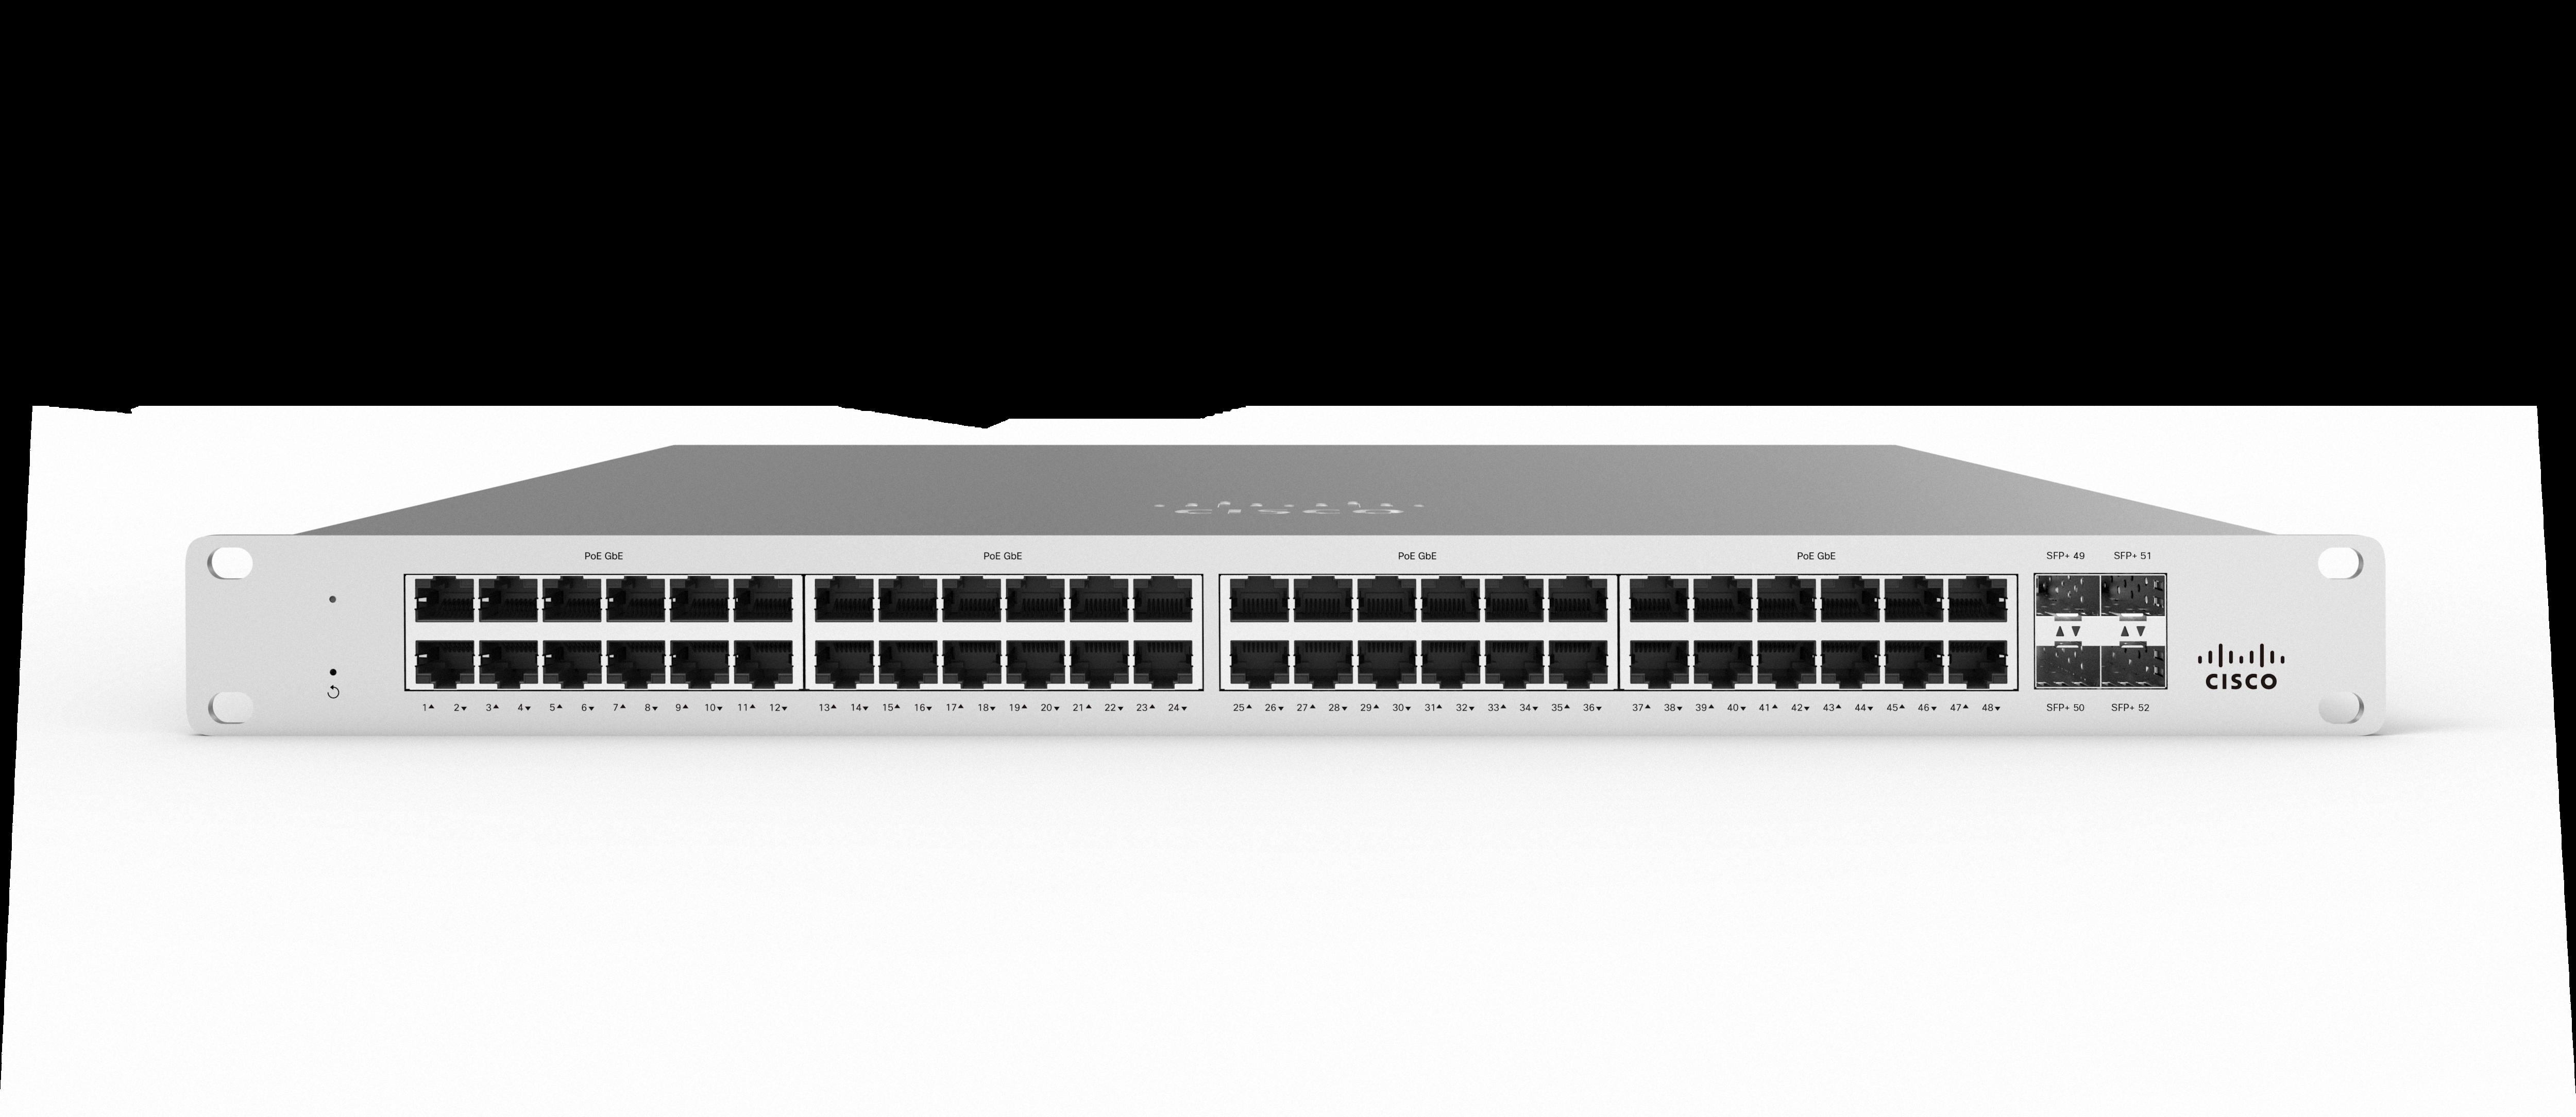 MS125-48LP